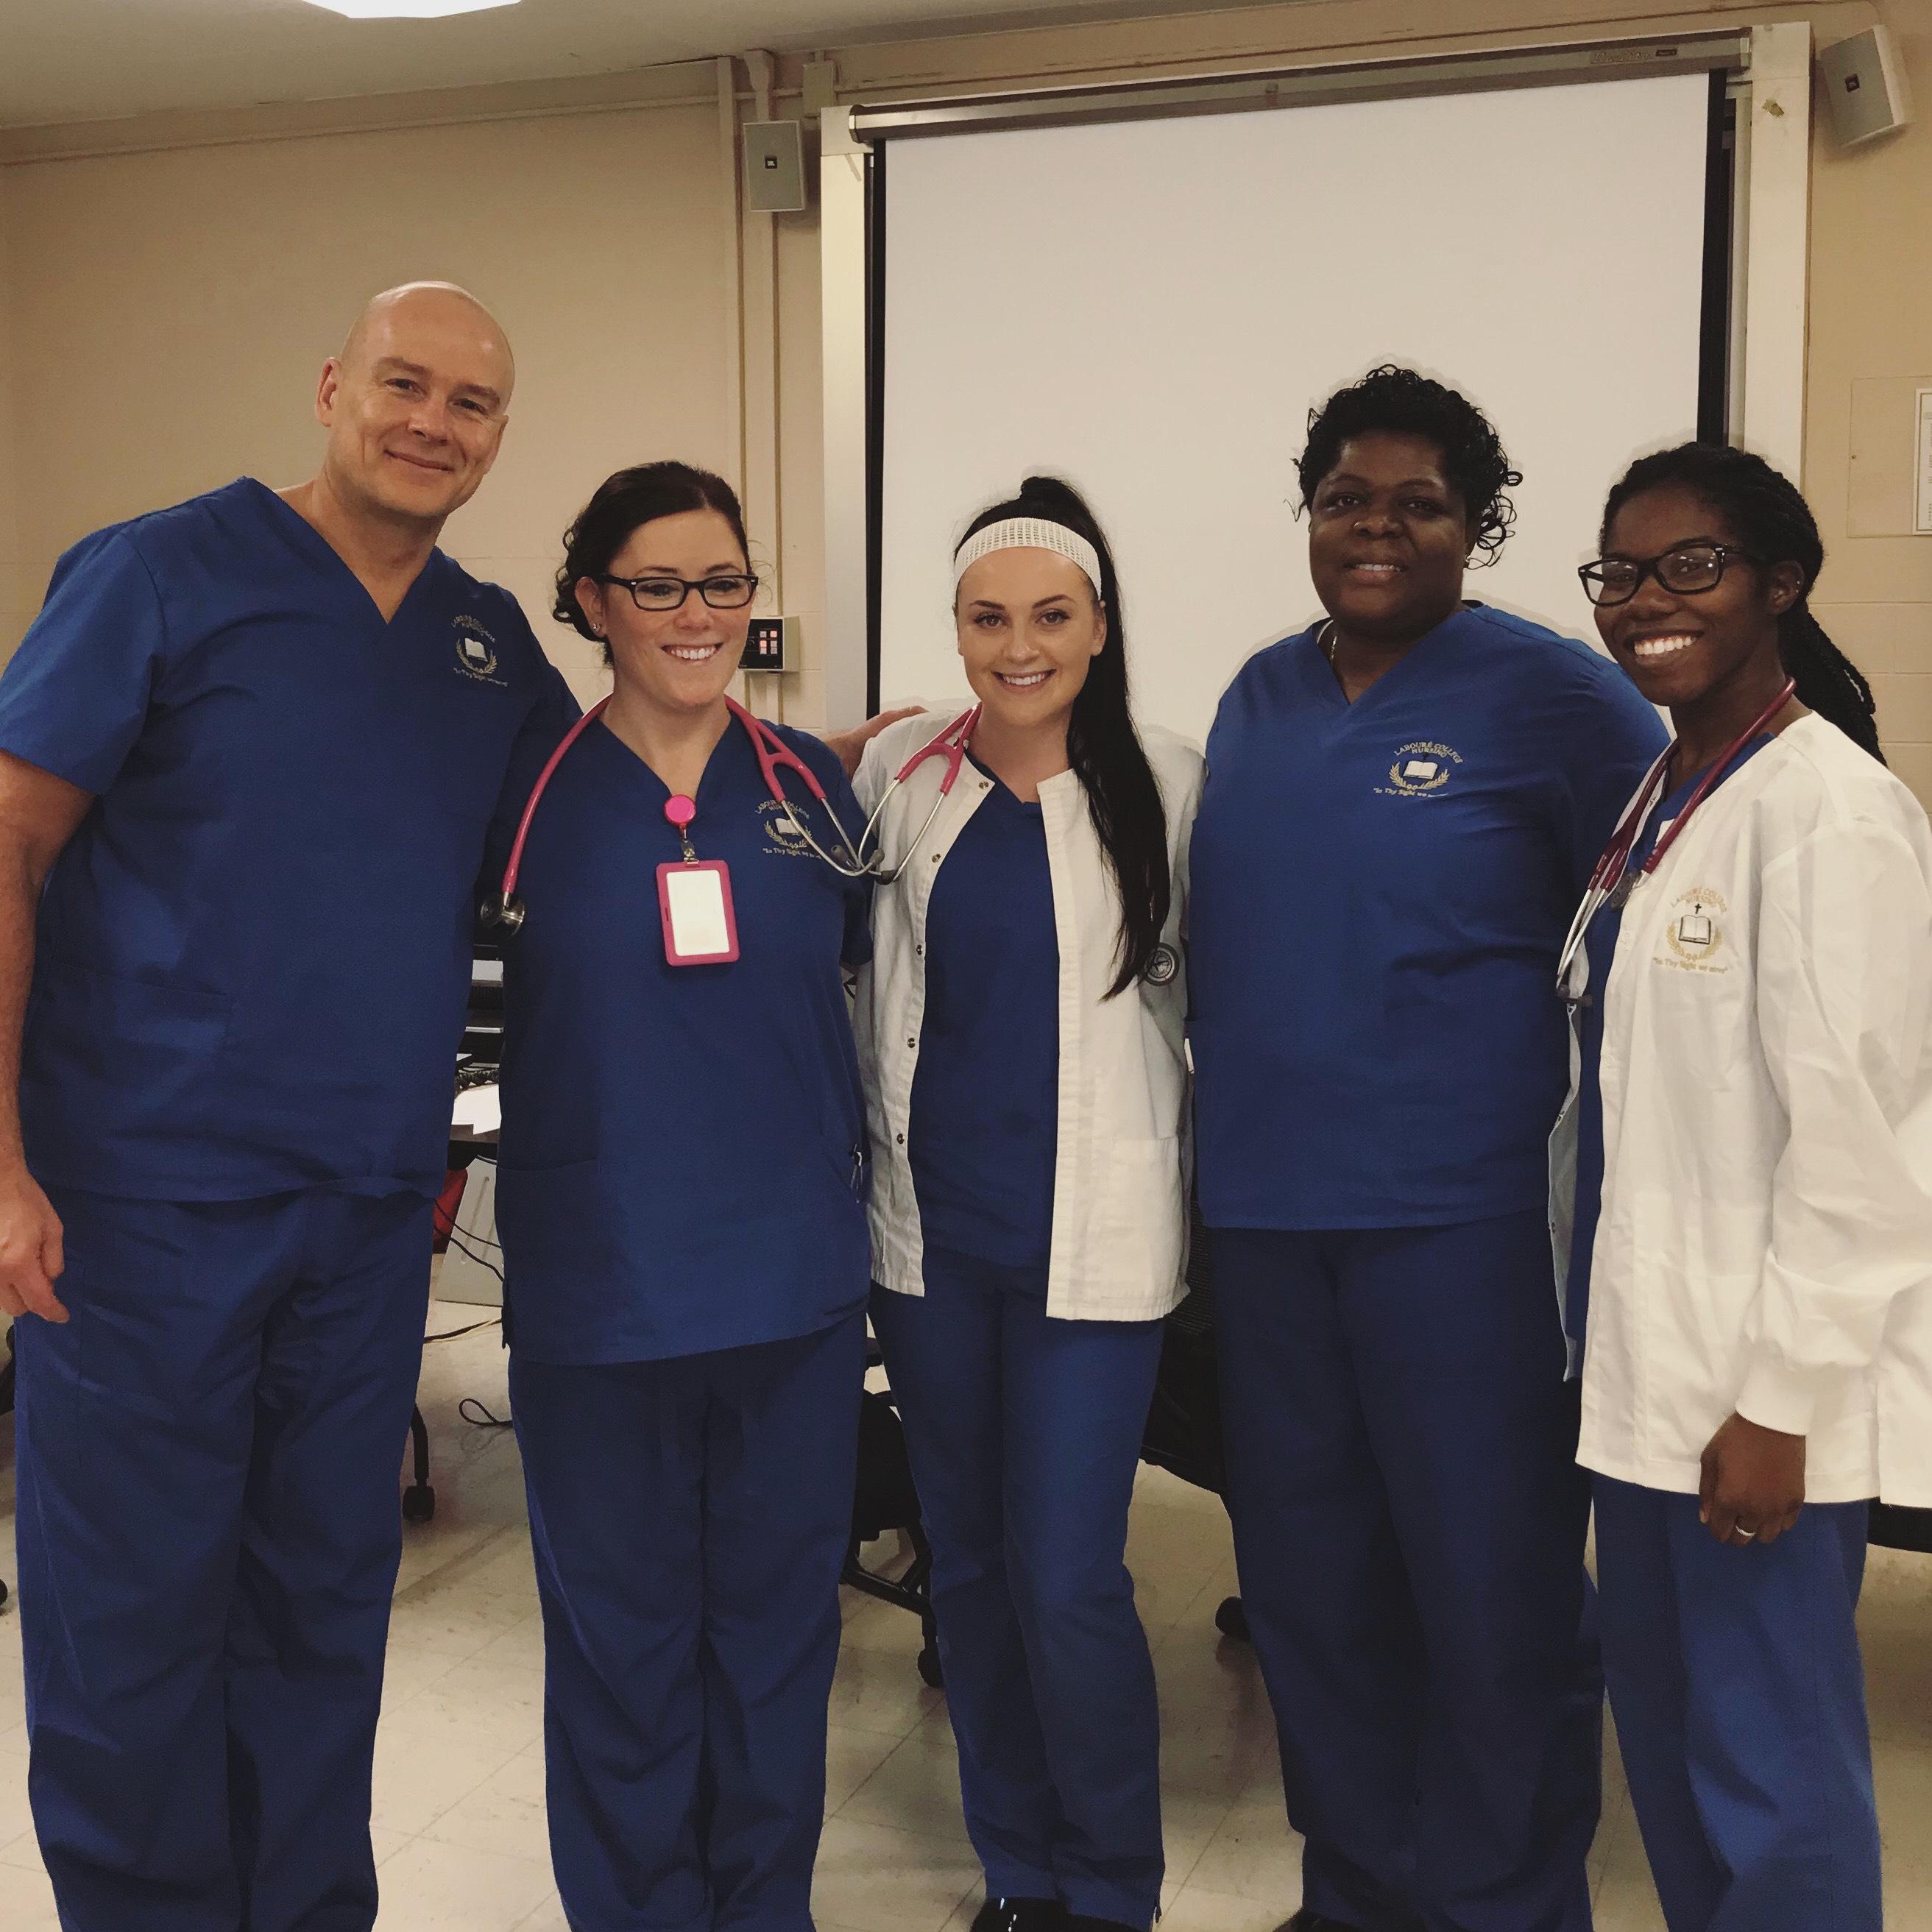 Student Spotlight: John Cummings, Student in Associate Nursing Program - Featured Image